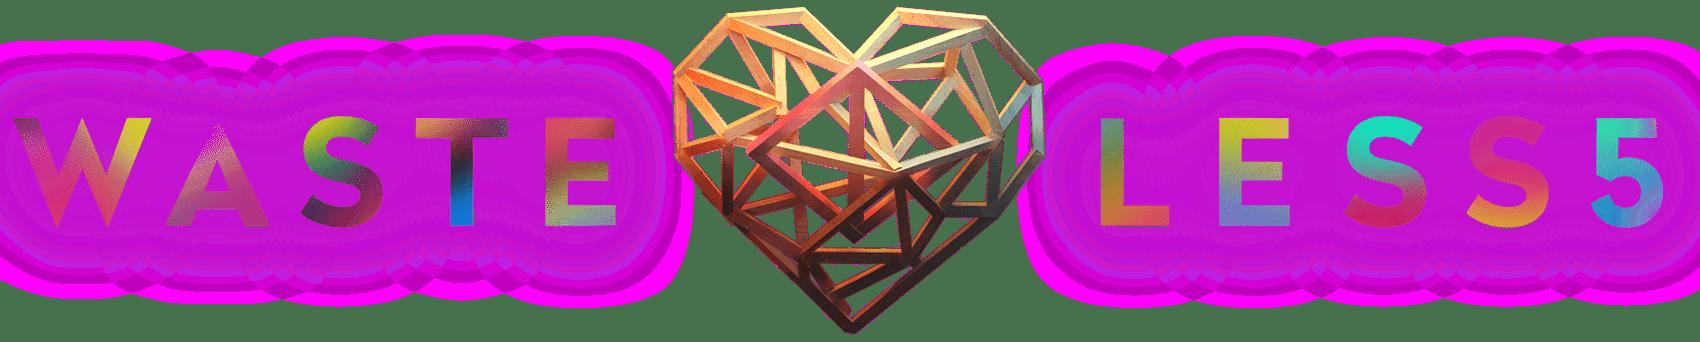 Wasteless Logo Herz